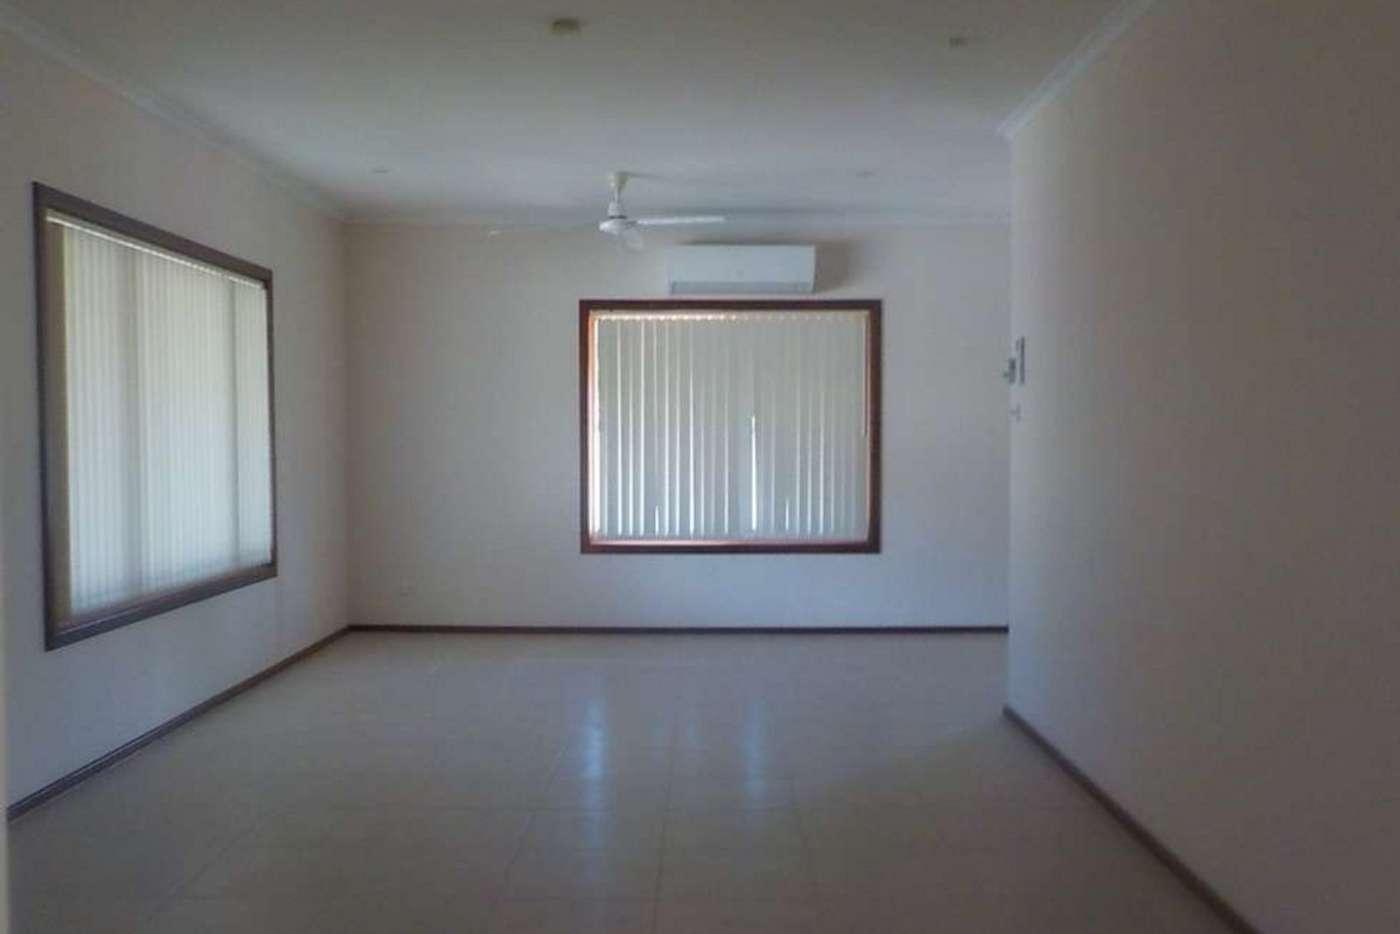 Seventh view of Homely house listing, 4 Lotus Court, Kununurra WA 6743